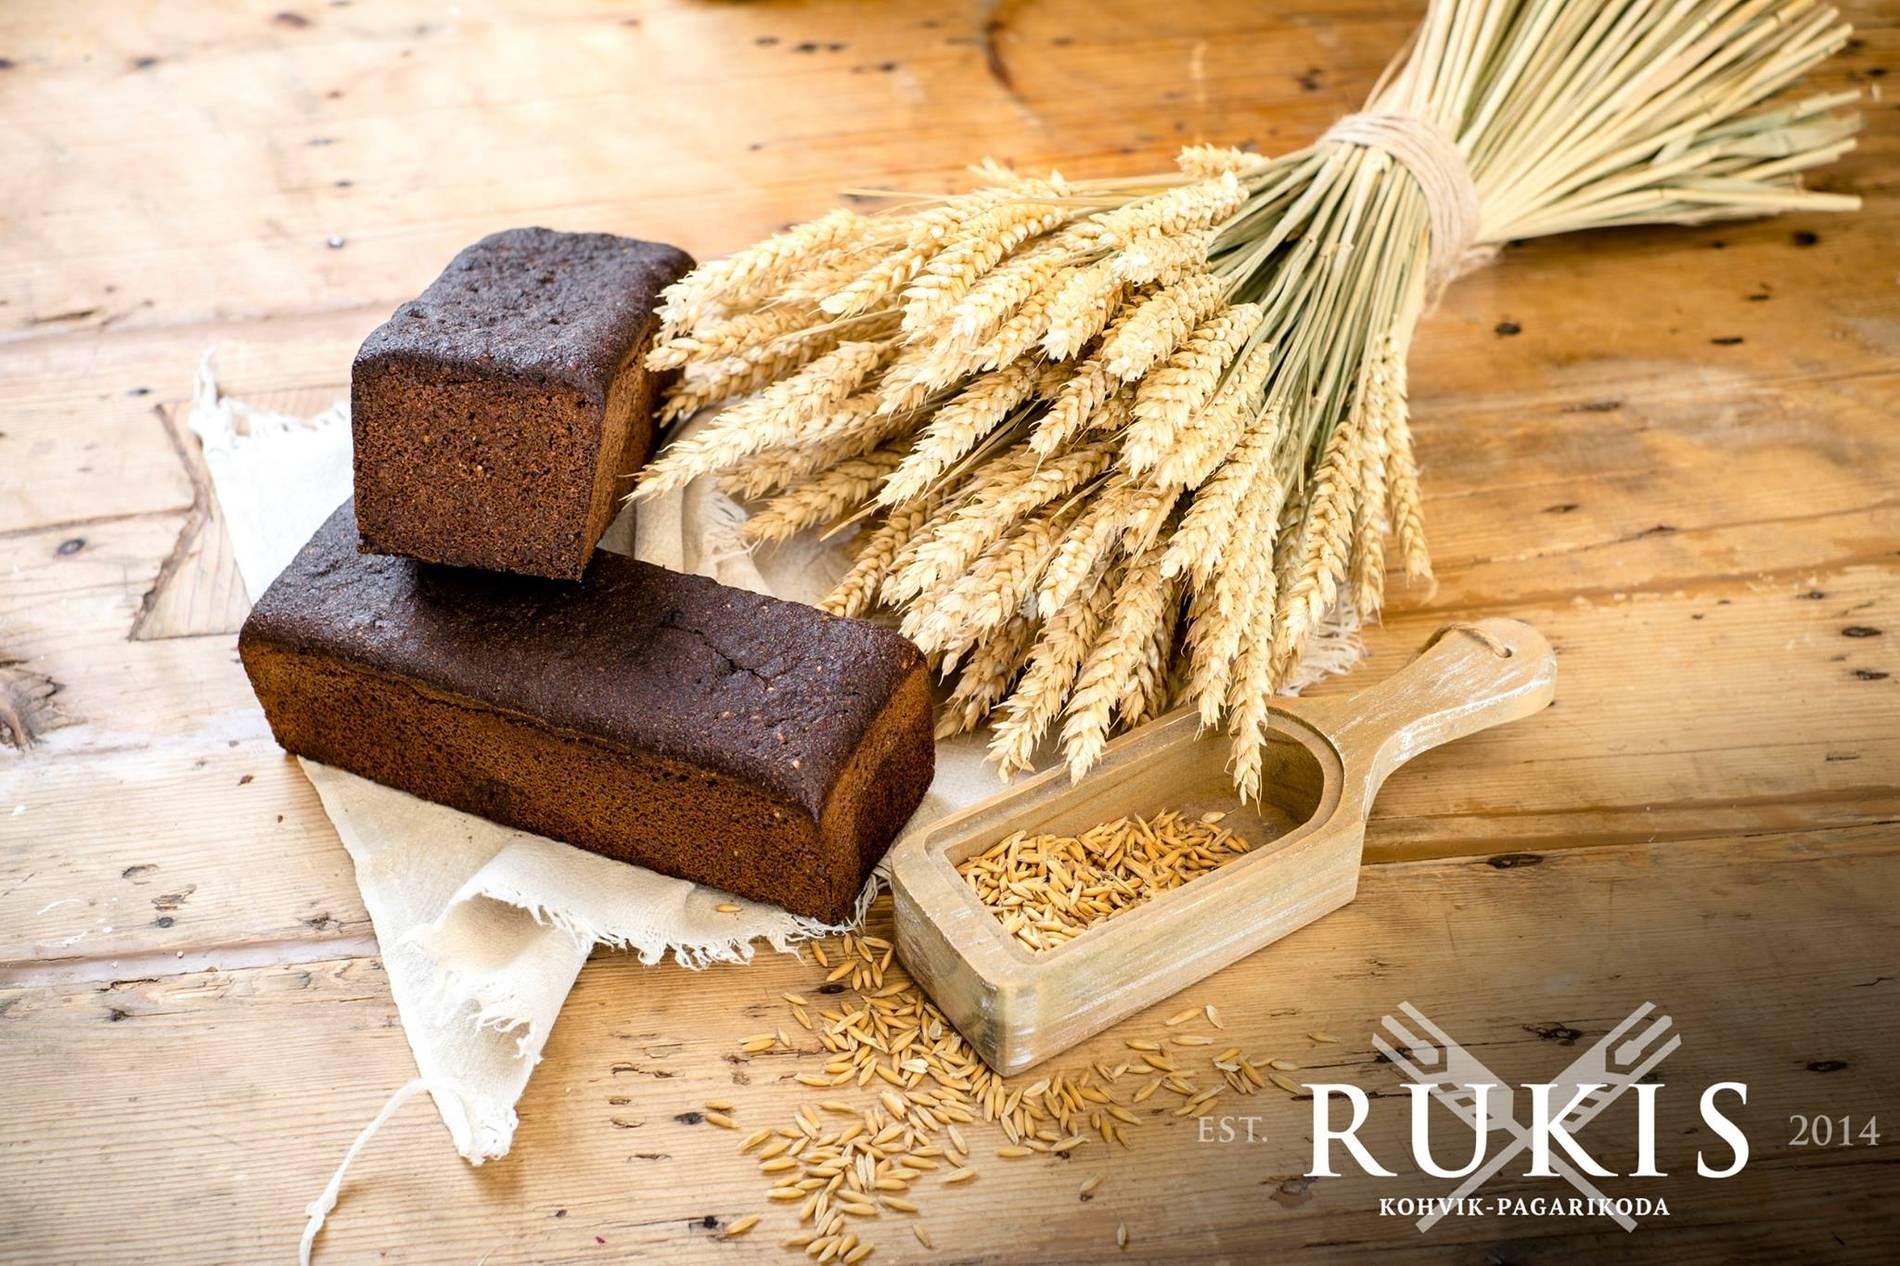 Rukis bread